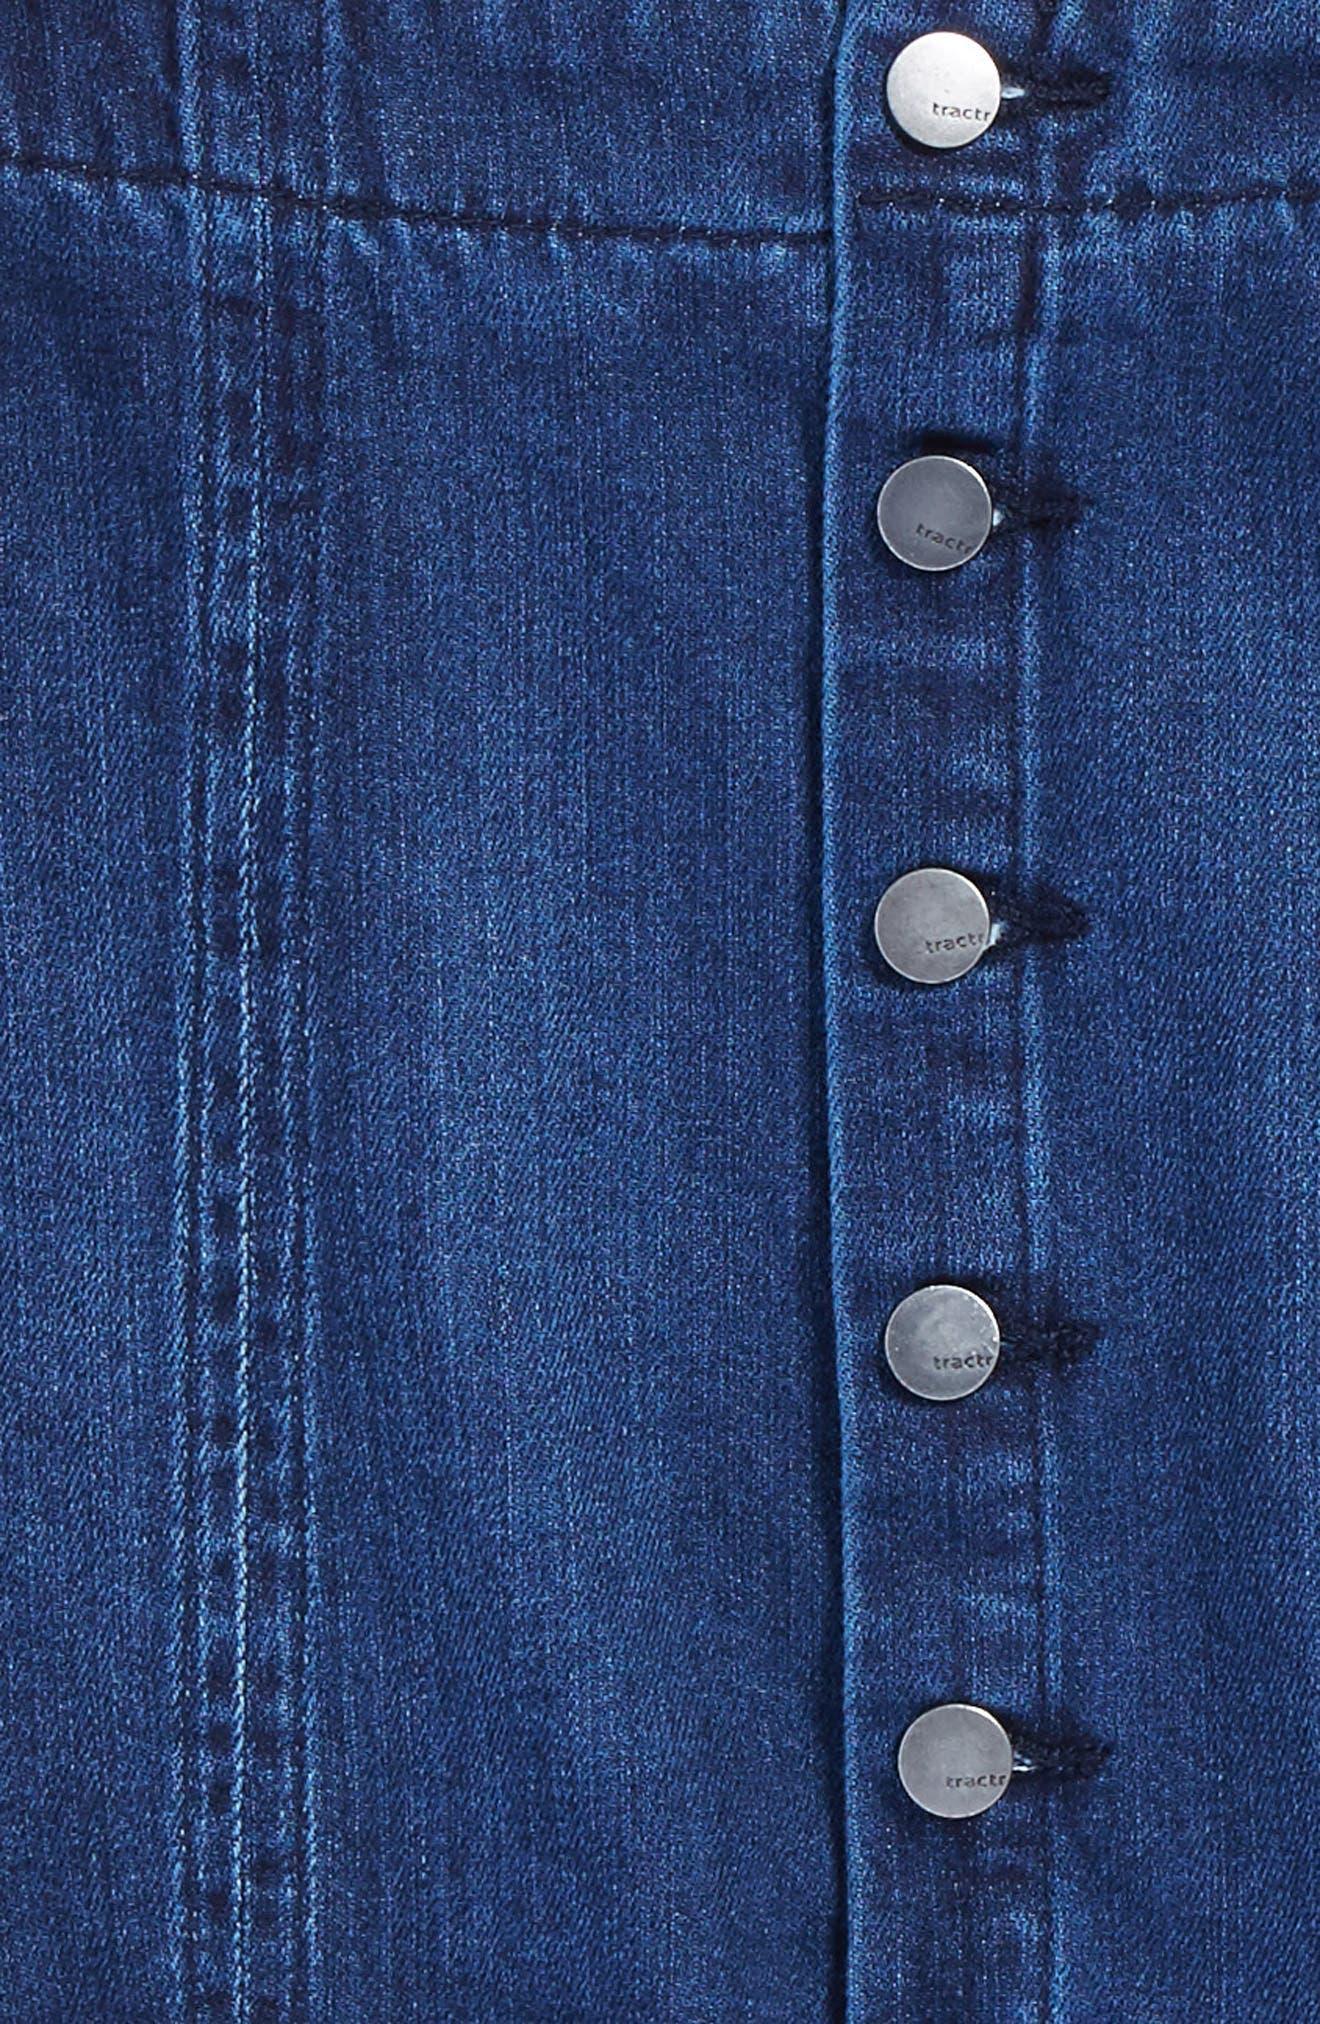 Alternate Image 3  - Tractr Frayed Scallop Denim Skirt (Big Girls)